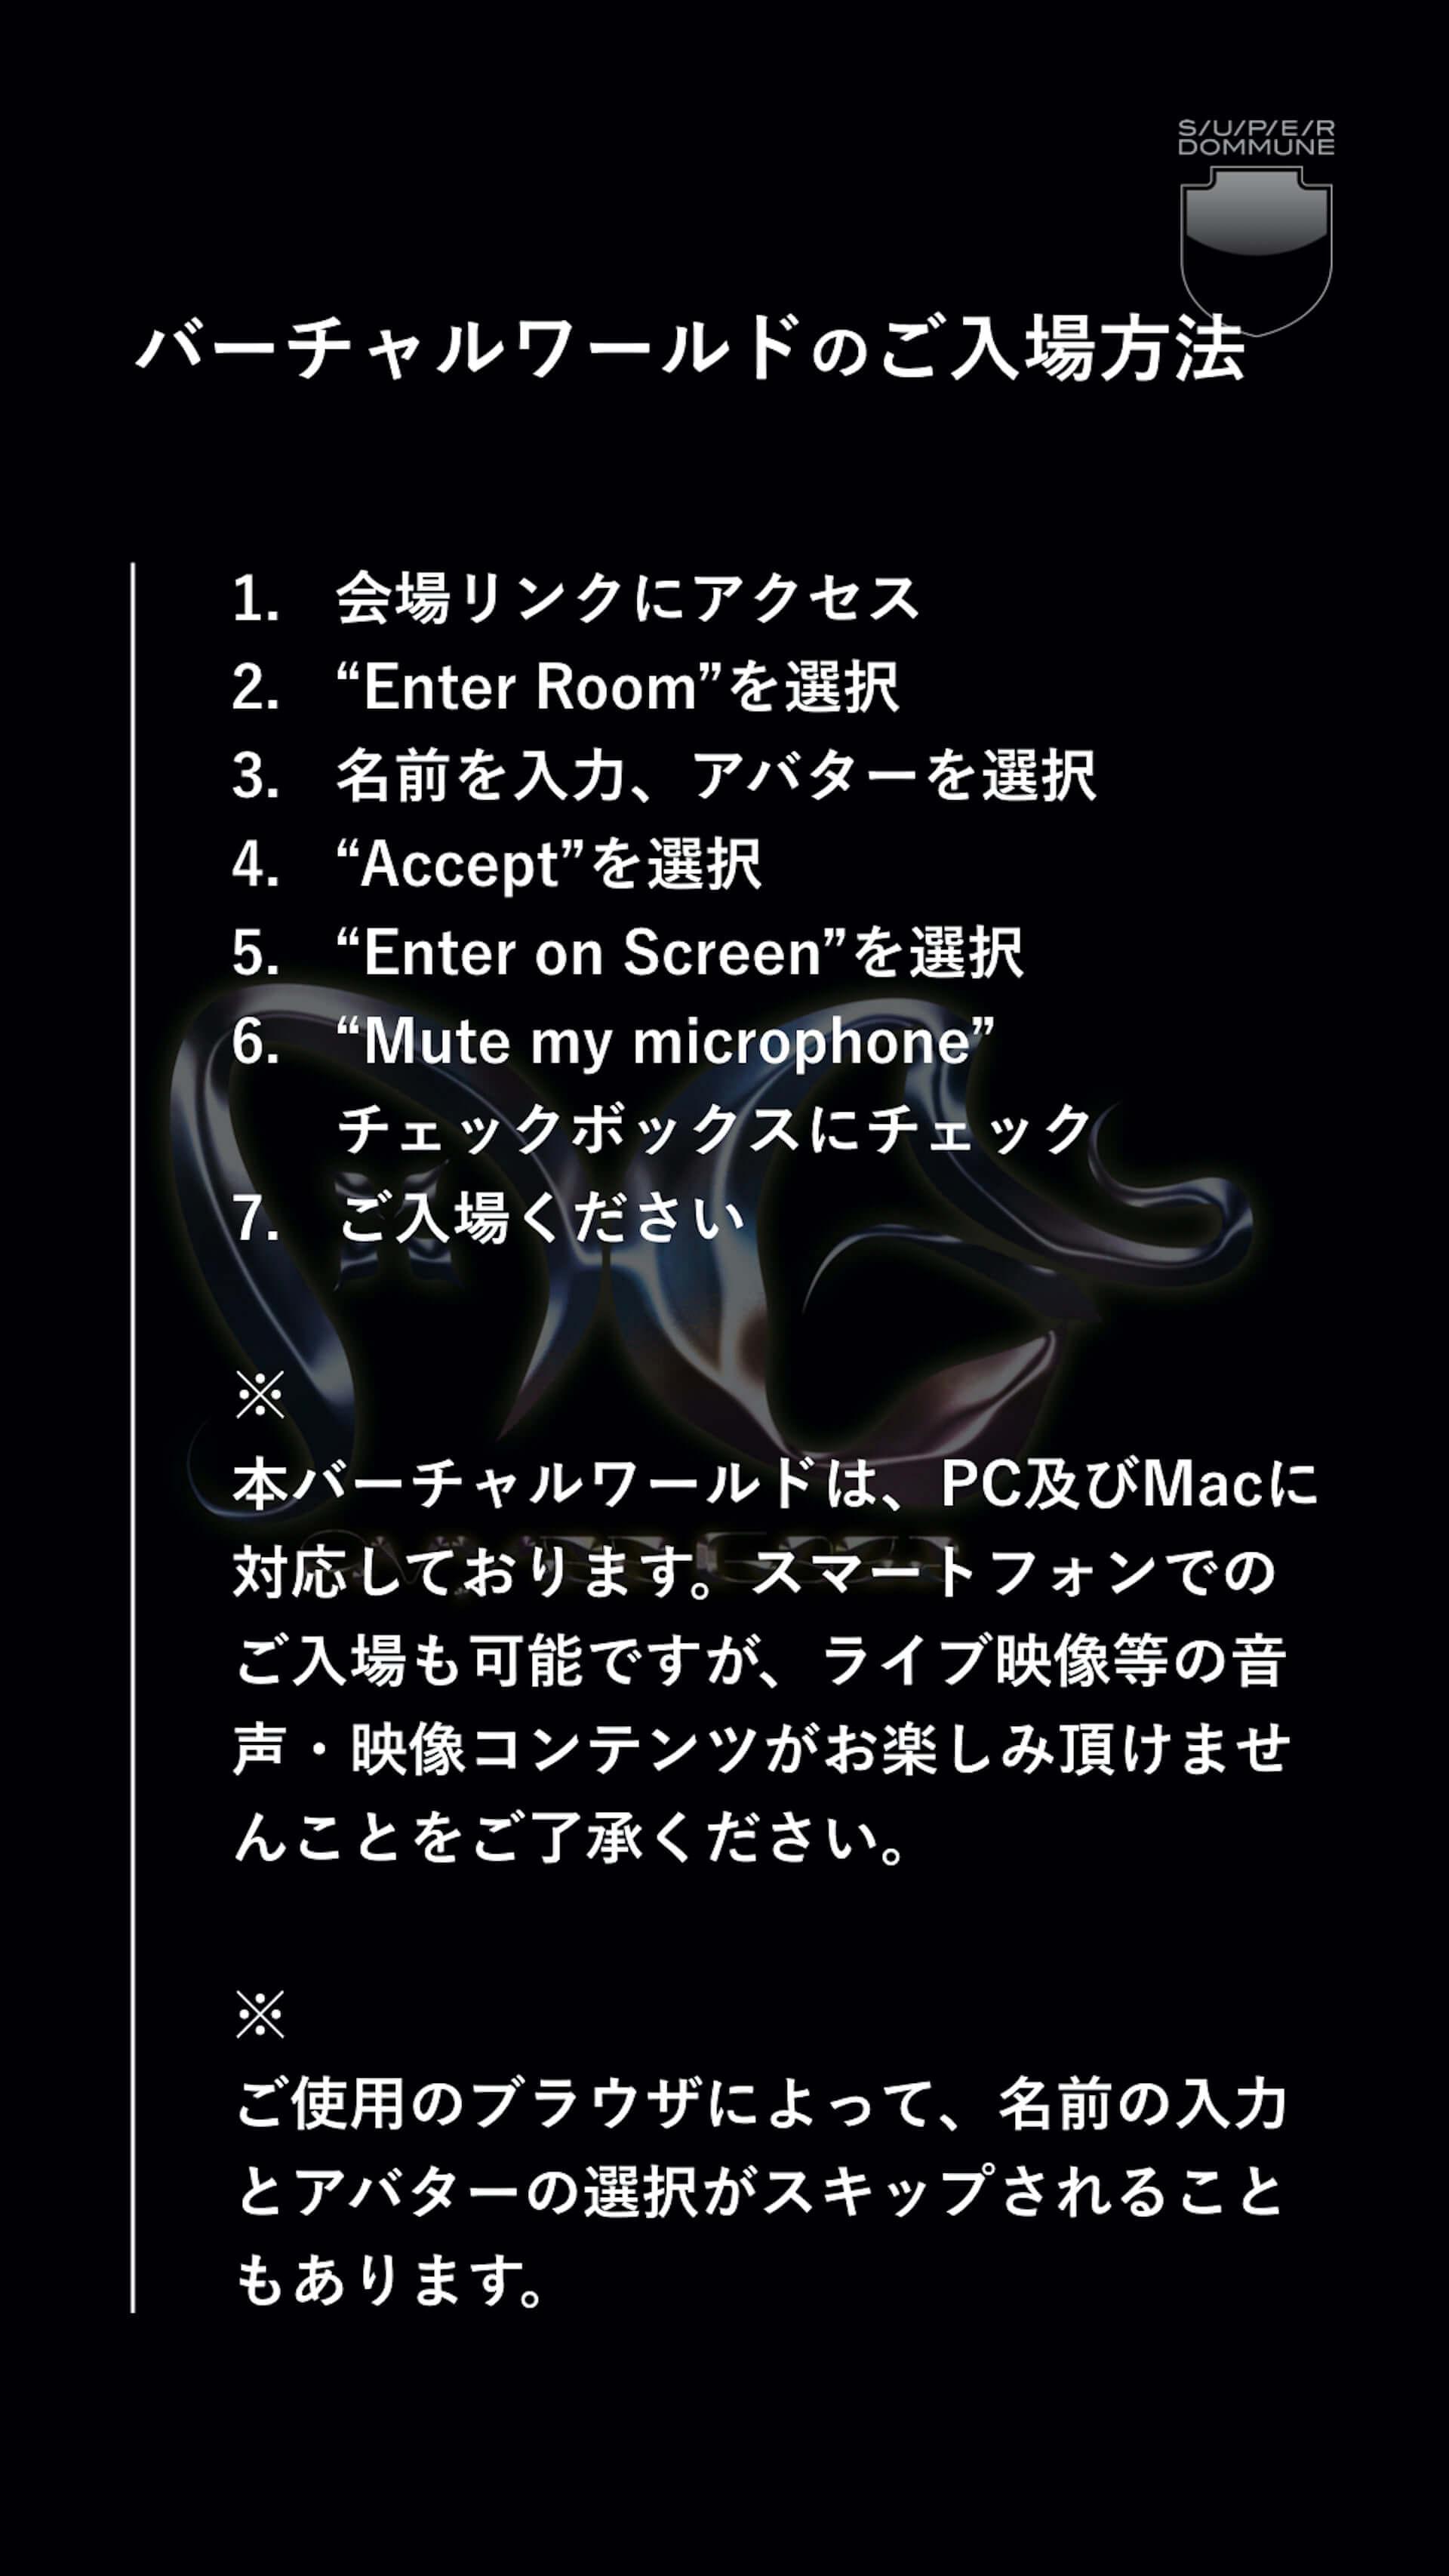 <AVYSS GAZE>がJUN INAGAWA、BBBBBBB、Masatoo Hiranoとのコラボアイテムを発表!バーチャルワールドも公開 music200918_avyssgaze_8-1920x3413